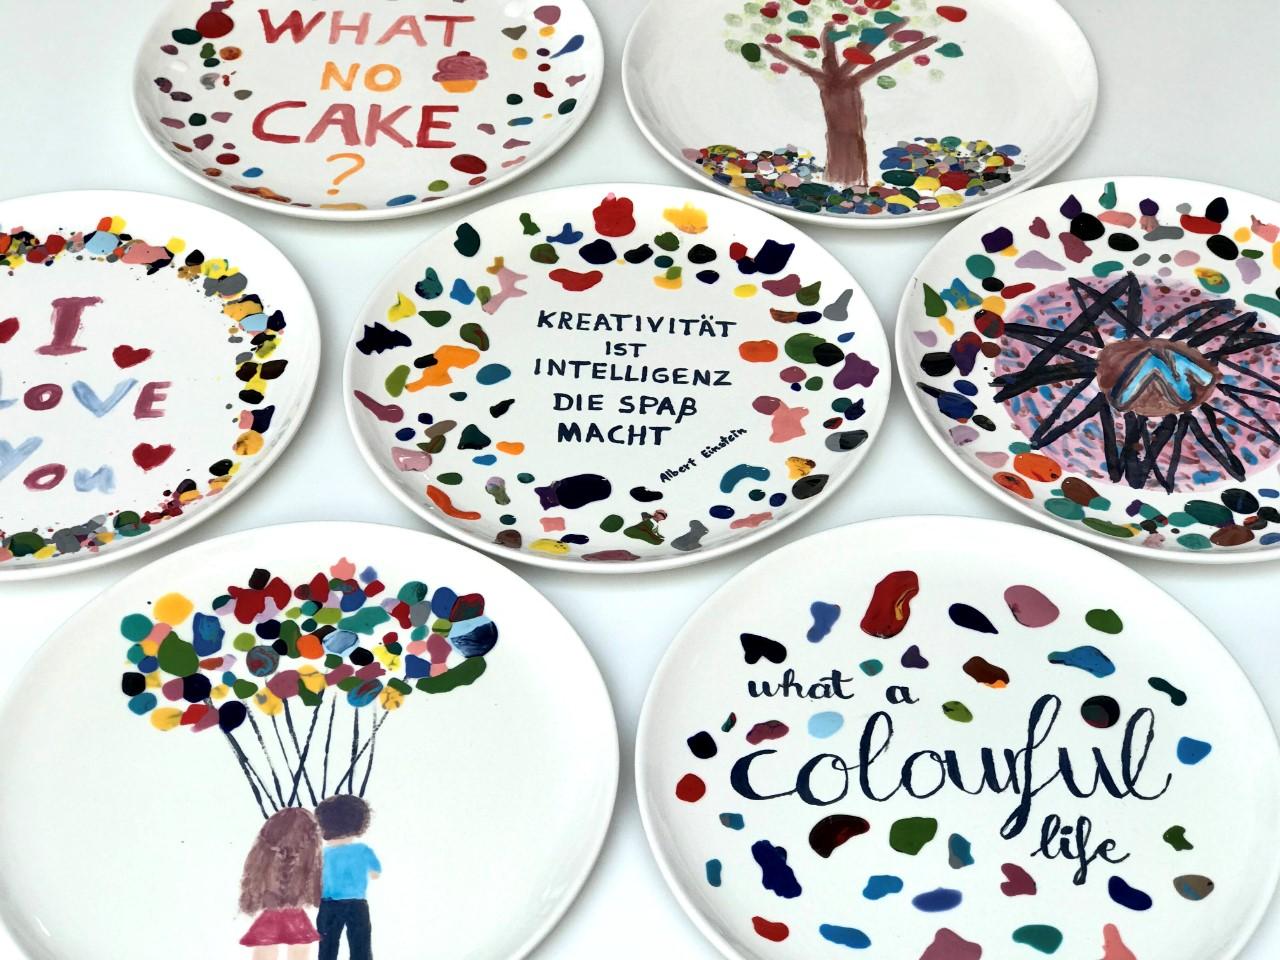 Workshop Konfetti Technik Fur Kinder Ab 8 Und Erwachsene Potteria Keramik Bemalen Neuss